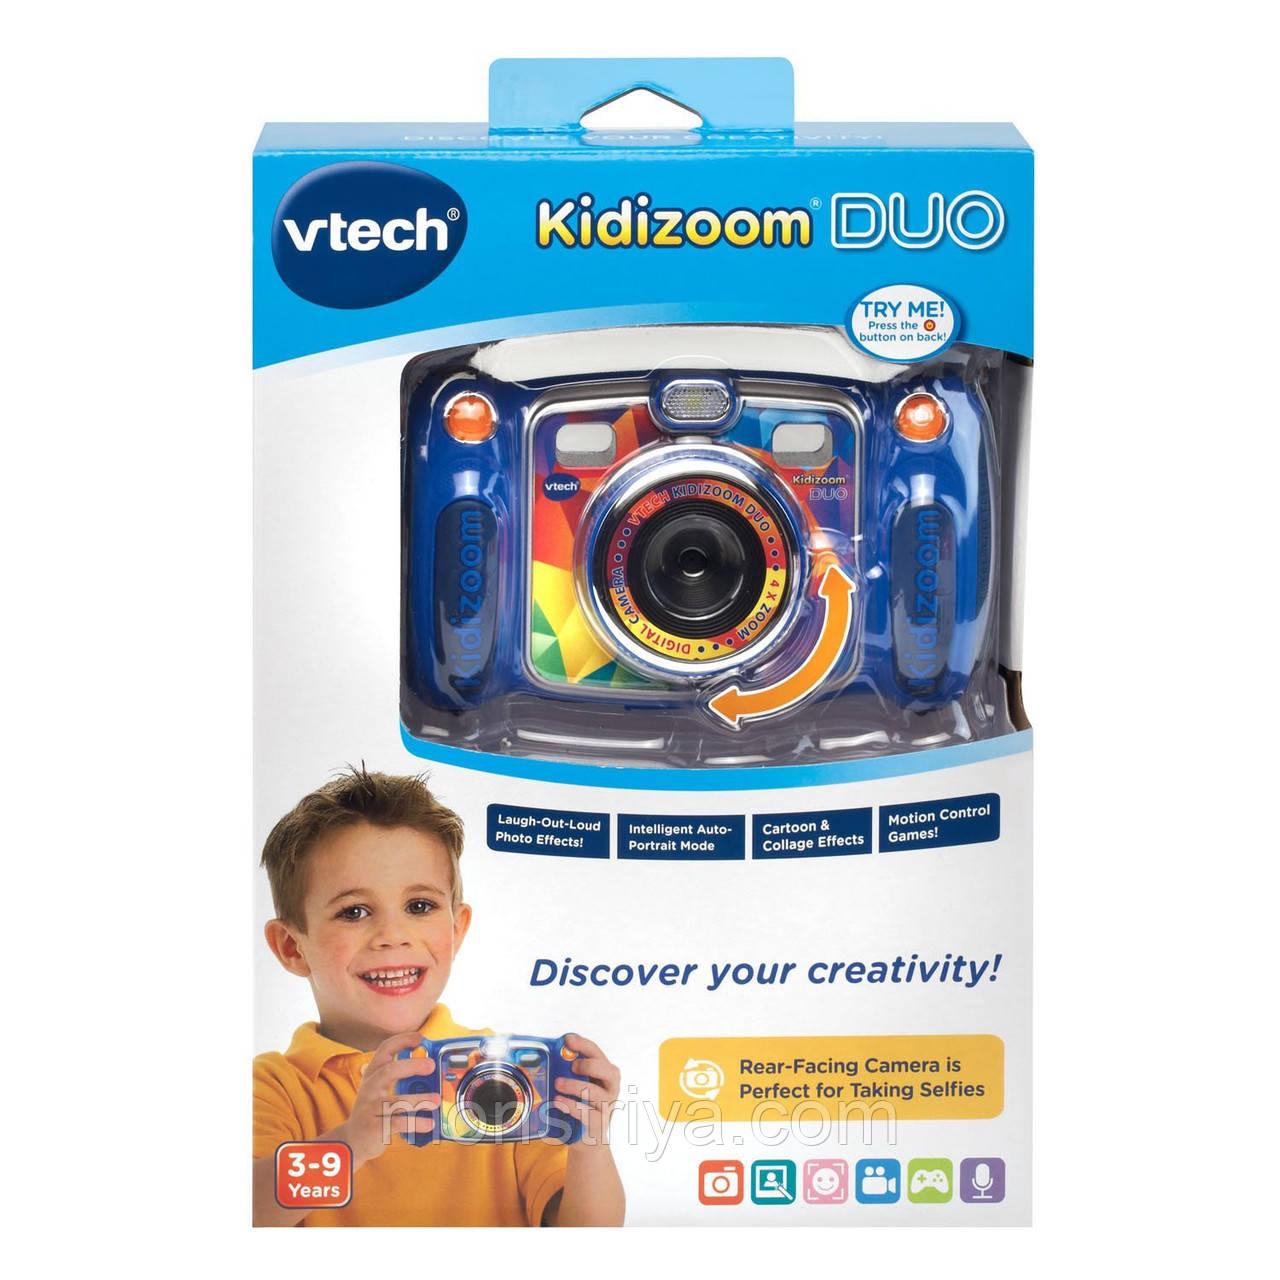 Детский цифровой фотоаппарат Vtech Kidizoom Duo с двумя камерами